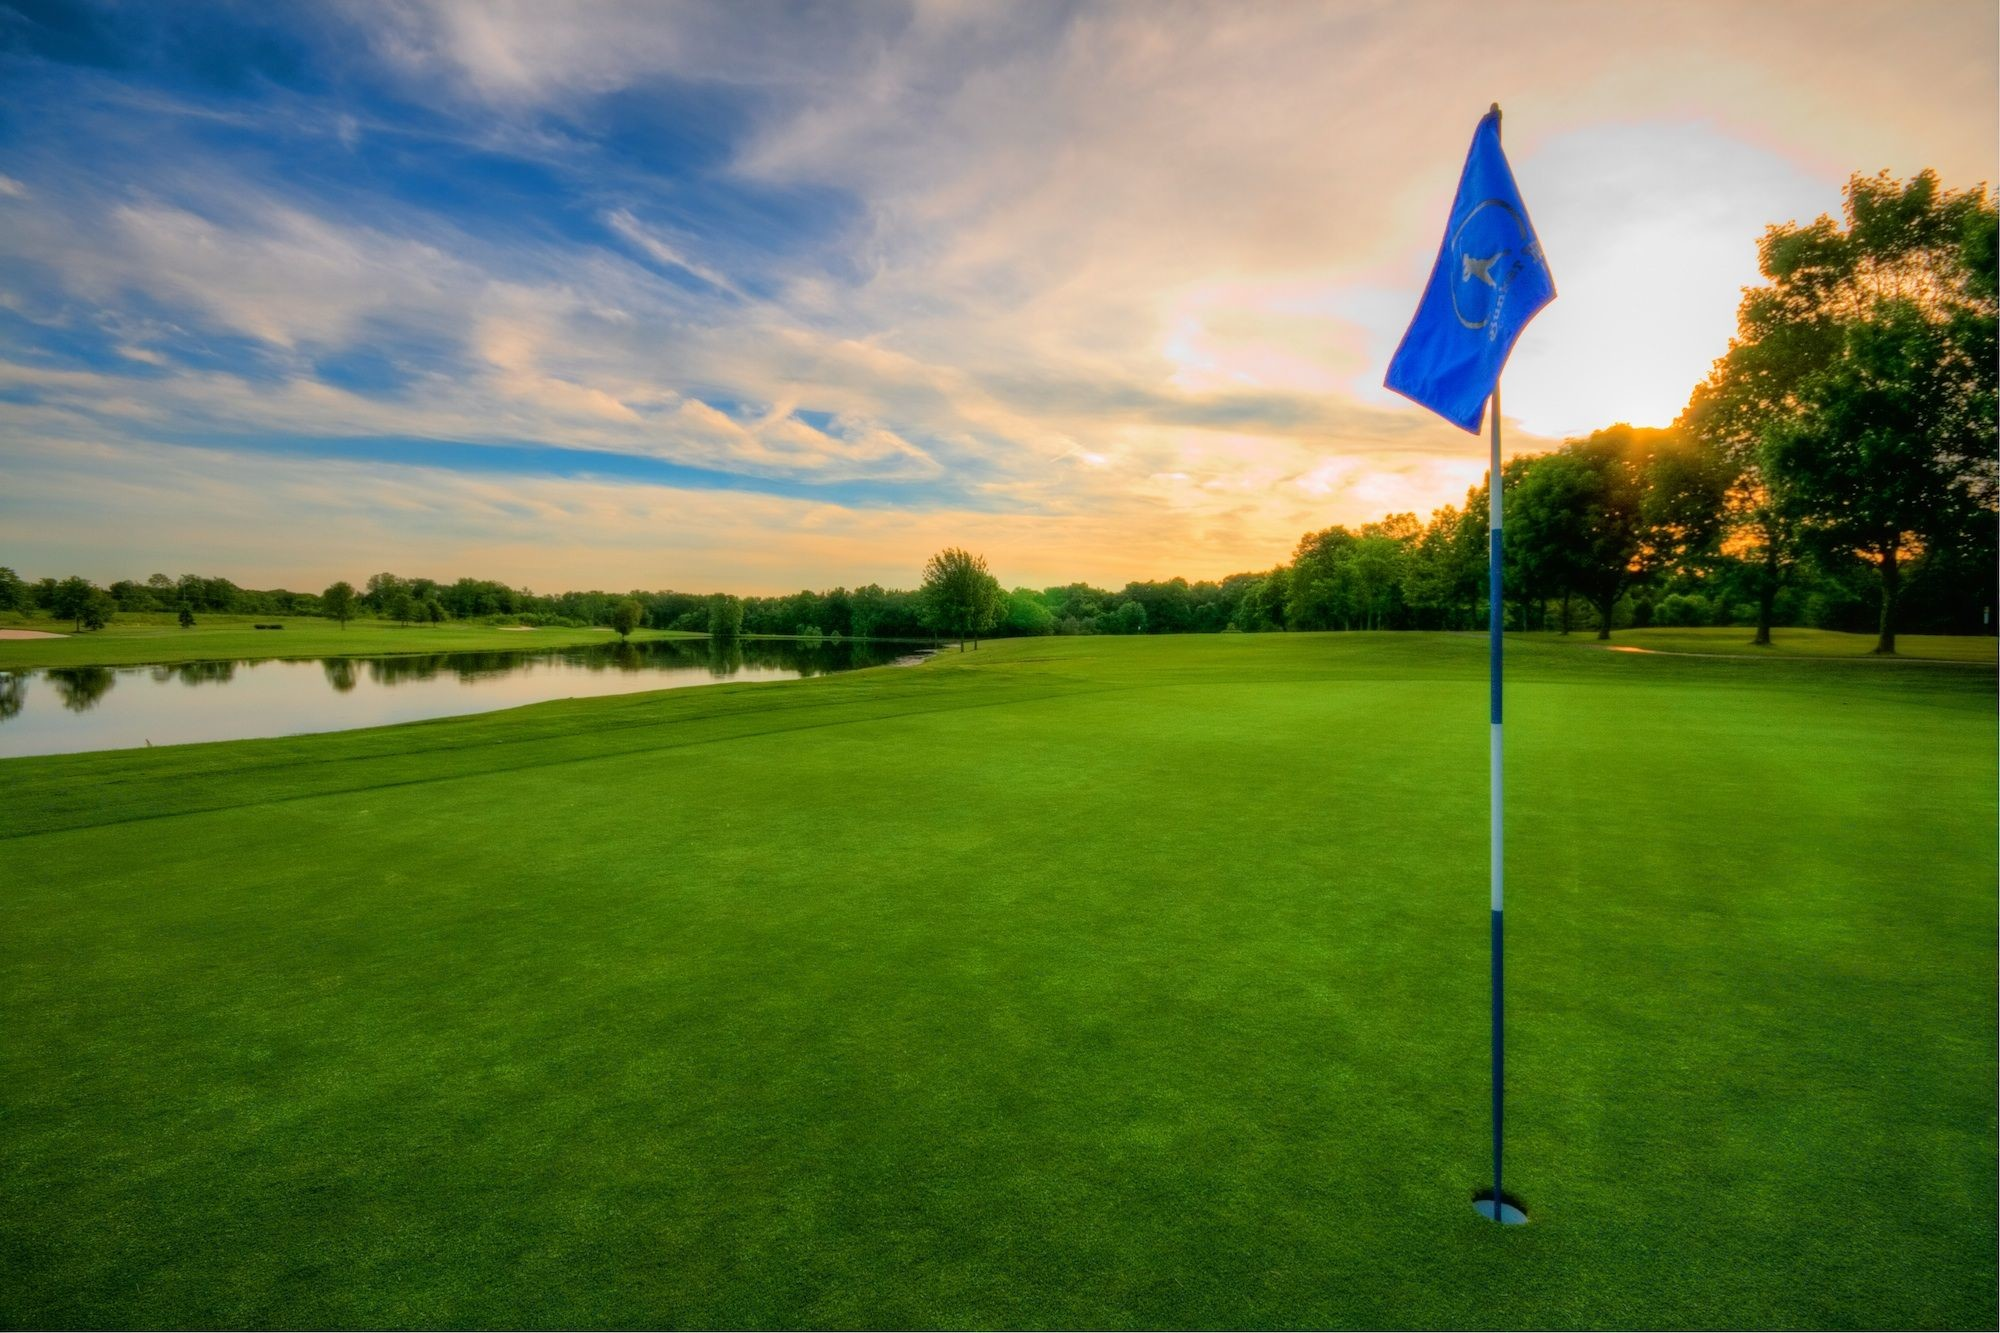 Res: 2000x1333, Golf Desktop Wallpapers - Golf Backgrounds for PC & Mac, Tablet, Laptop,  Mobile